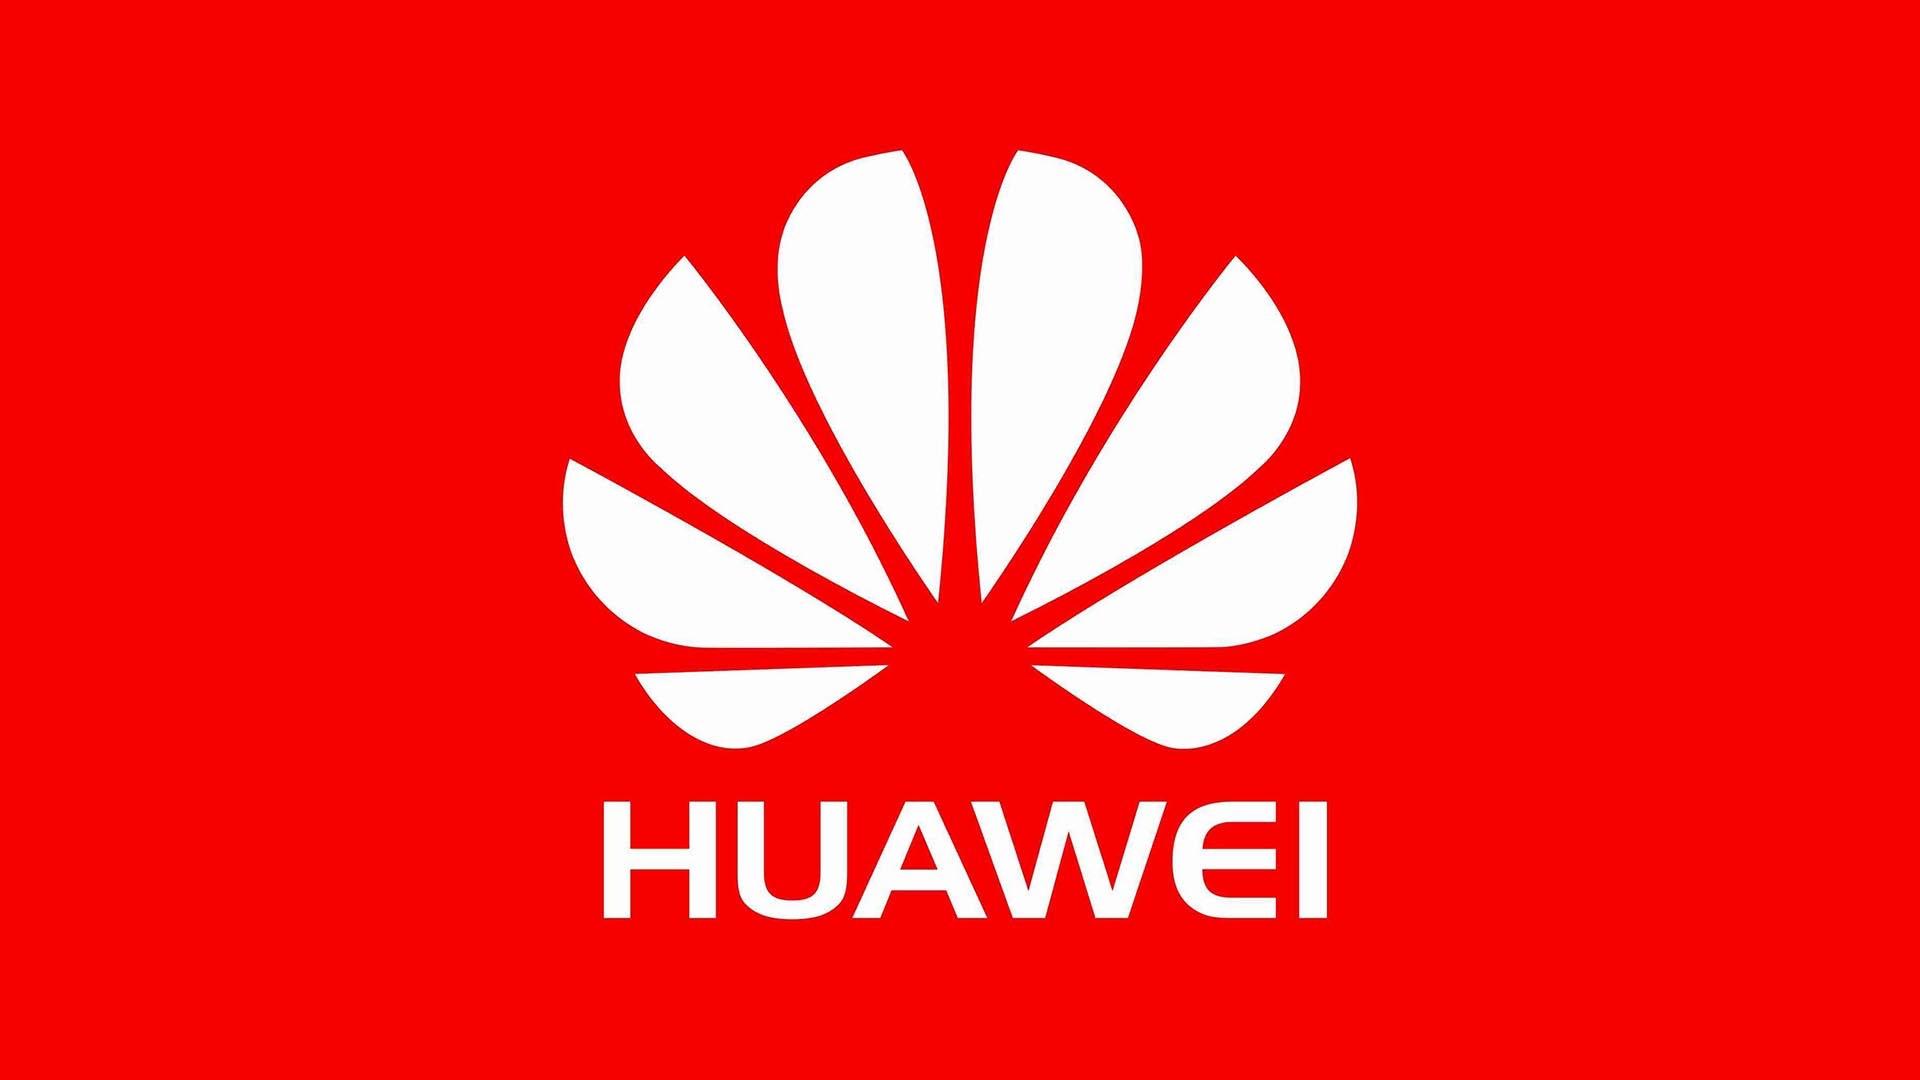 Huawei (logo) / Mate 40